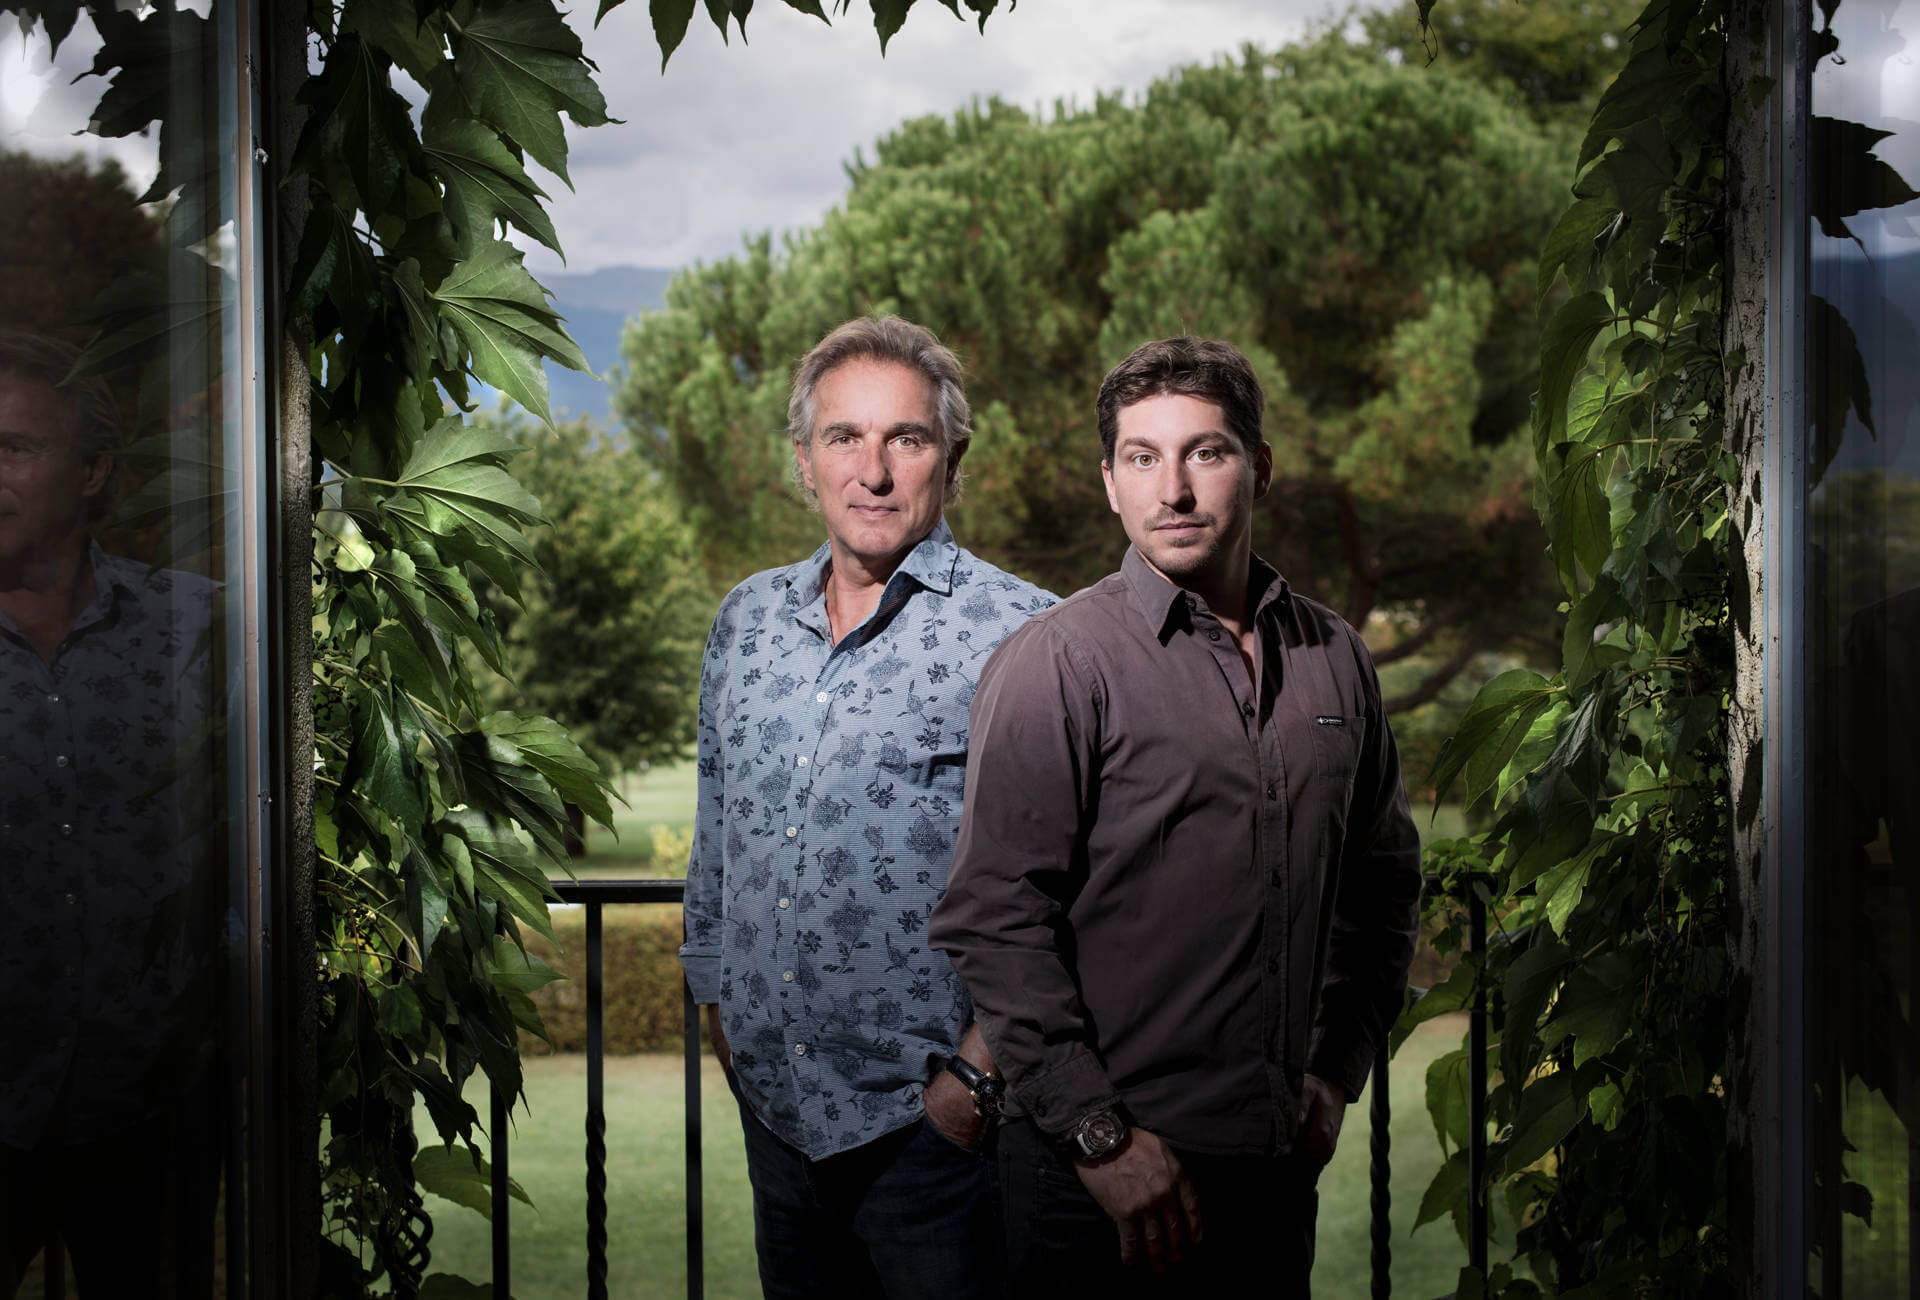 Antoine and Florian Preziuso